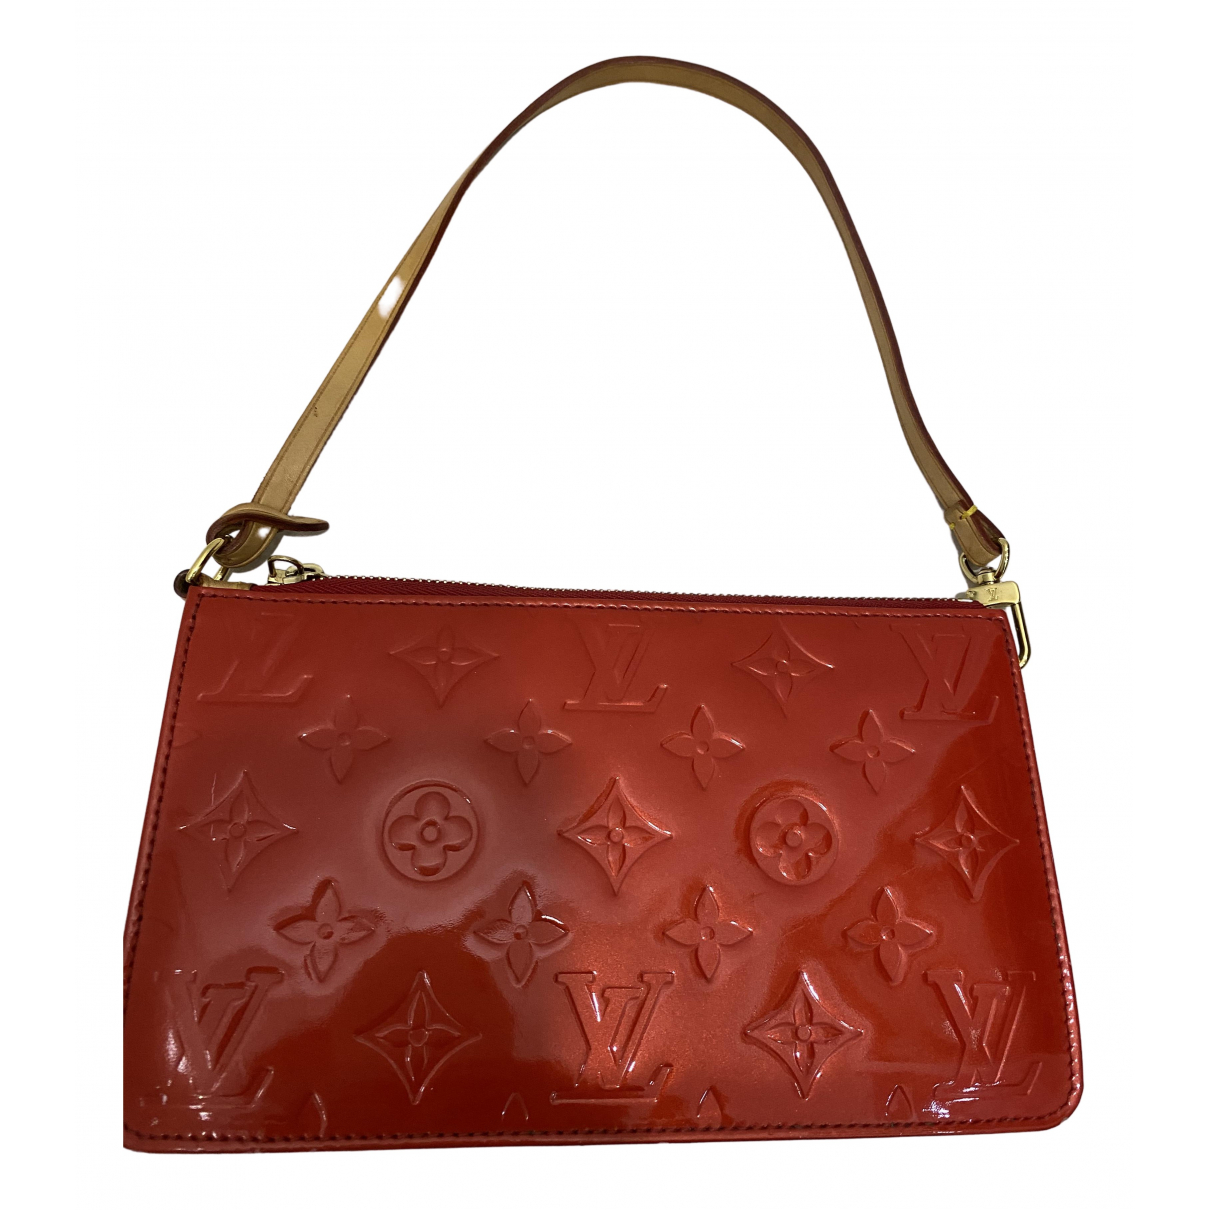 Louis Vuitton Pochette Accessoire Red Patent leather Clutch bag for Women \N